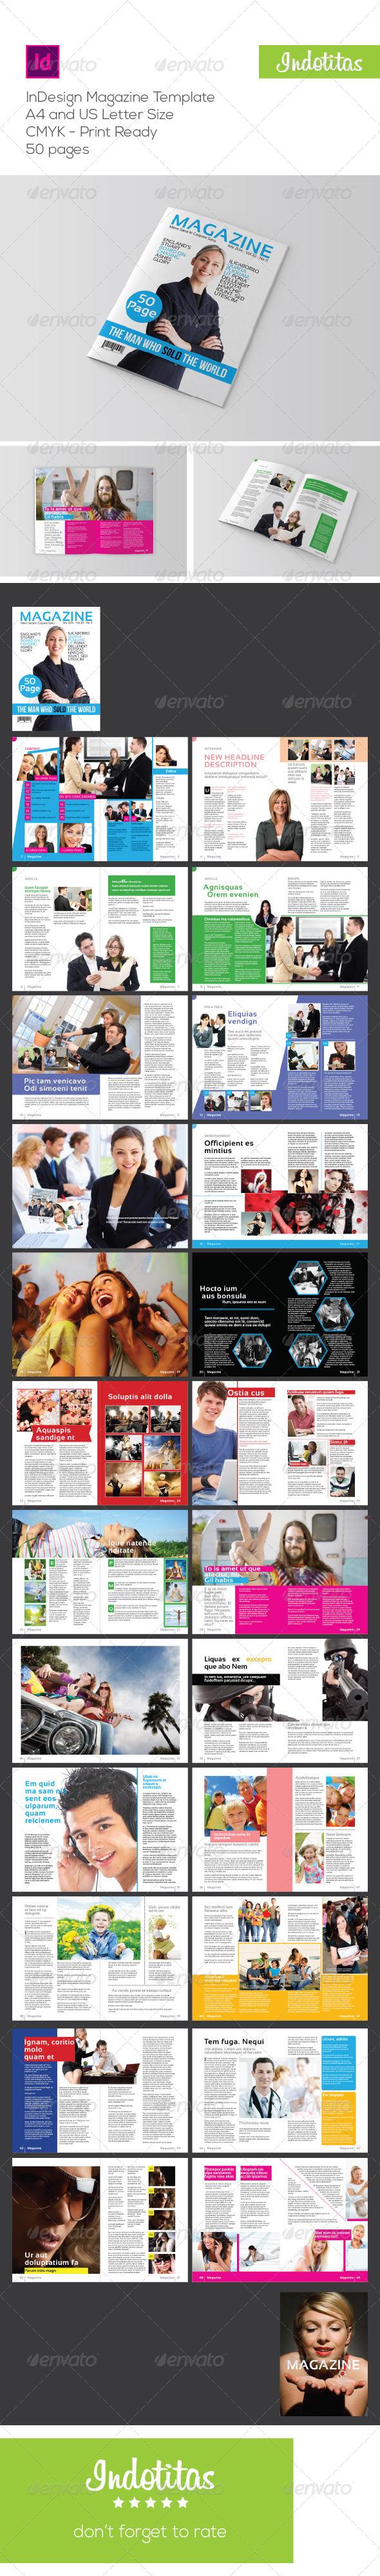 GraphicRiver InDesign Magazine Template 6537100